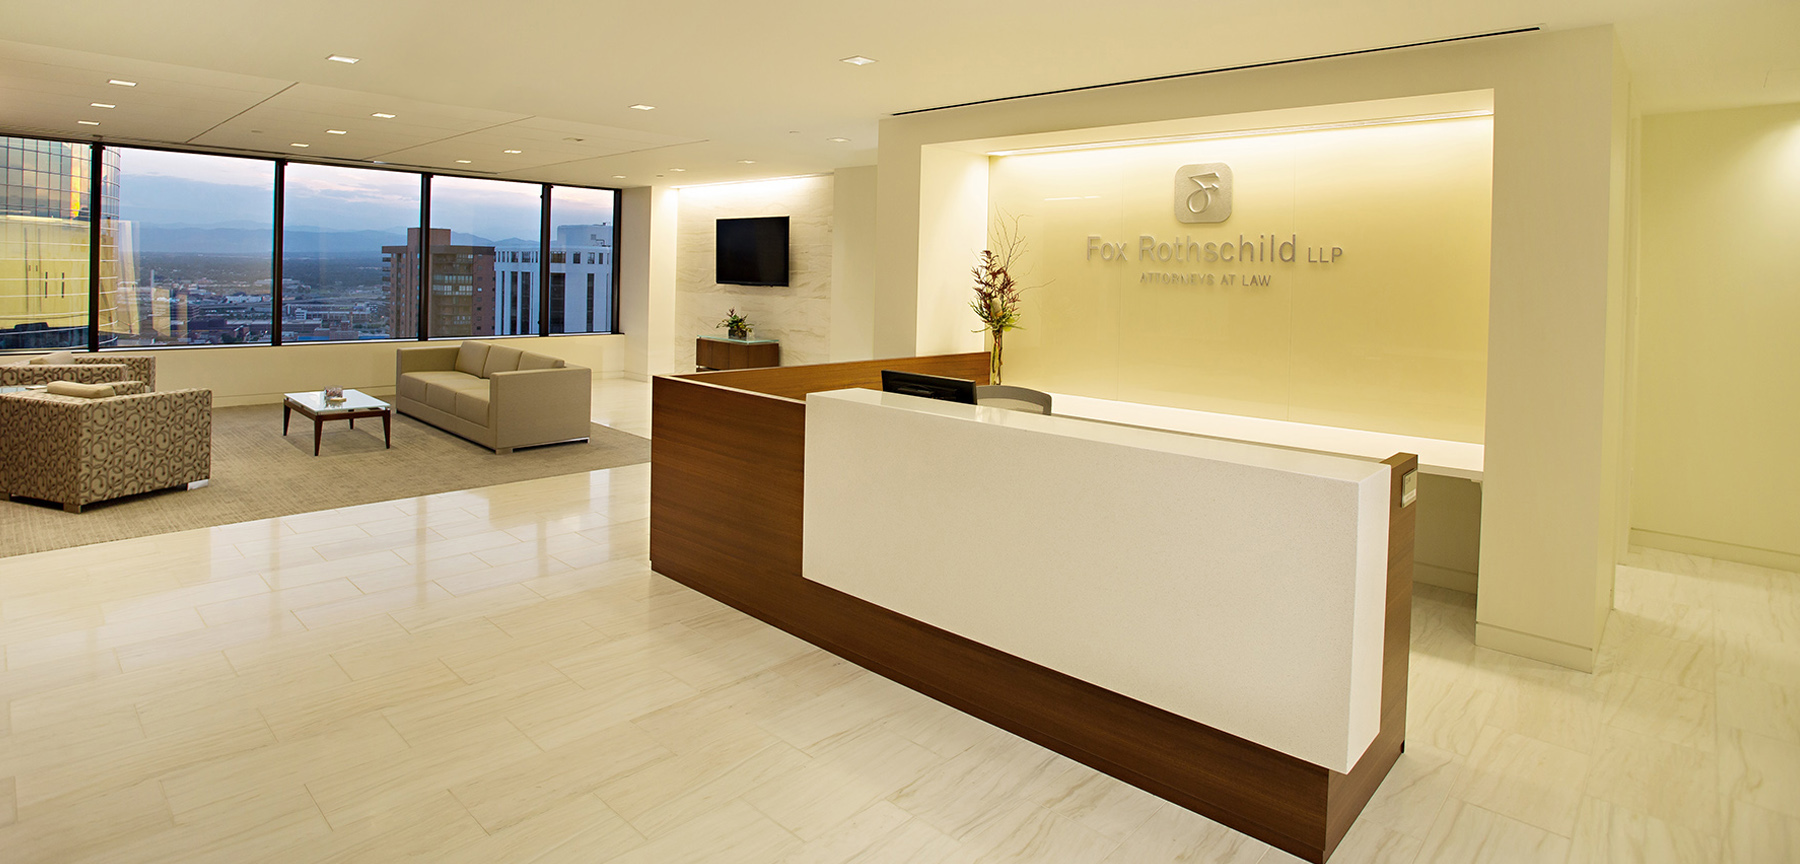 Fox Rothschild lobby